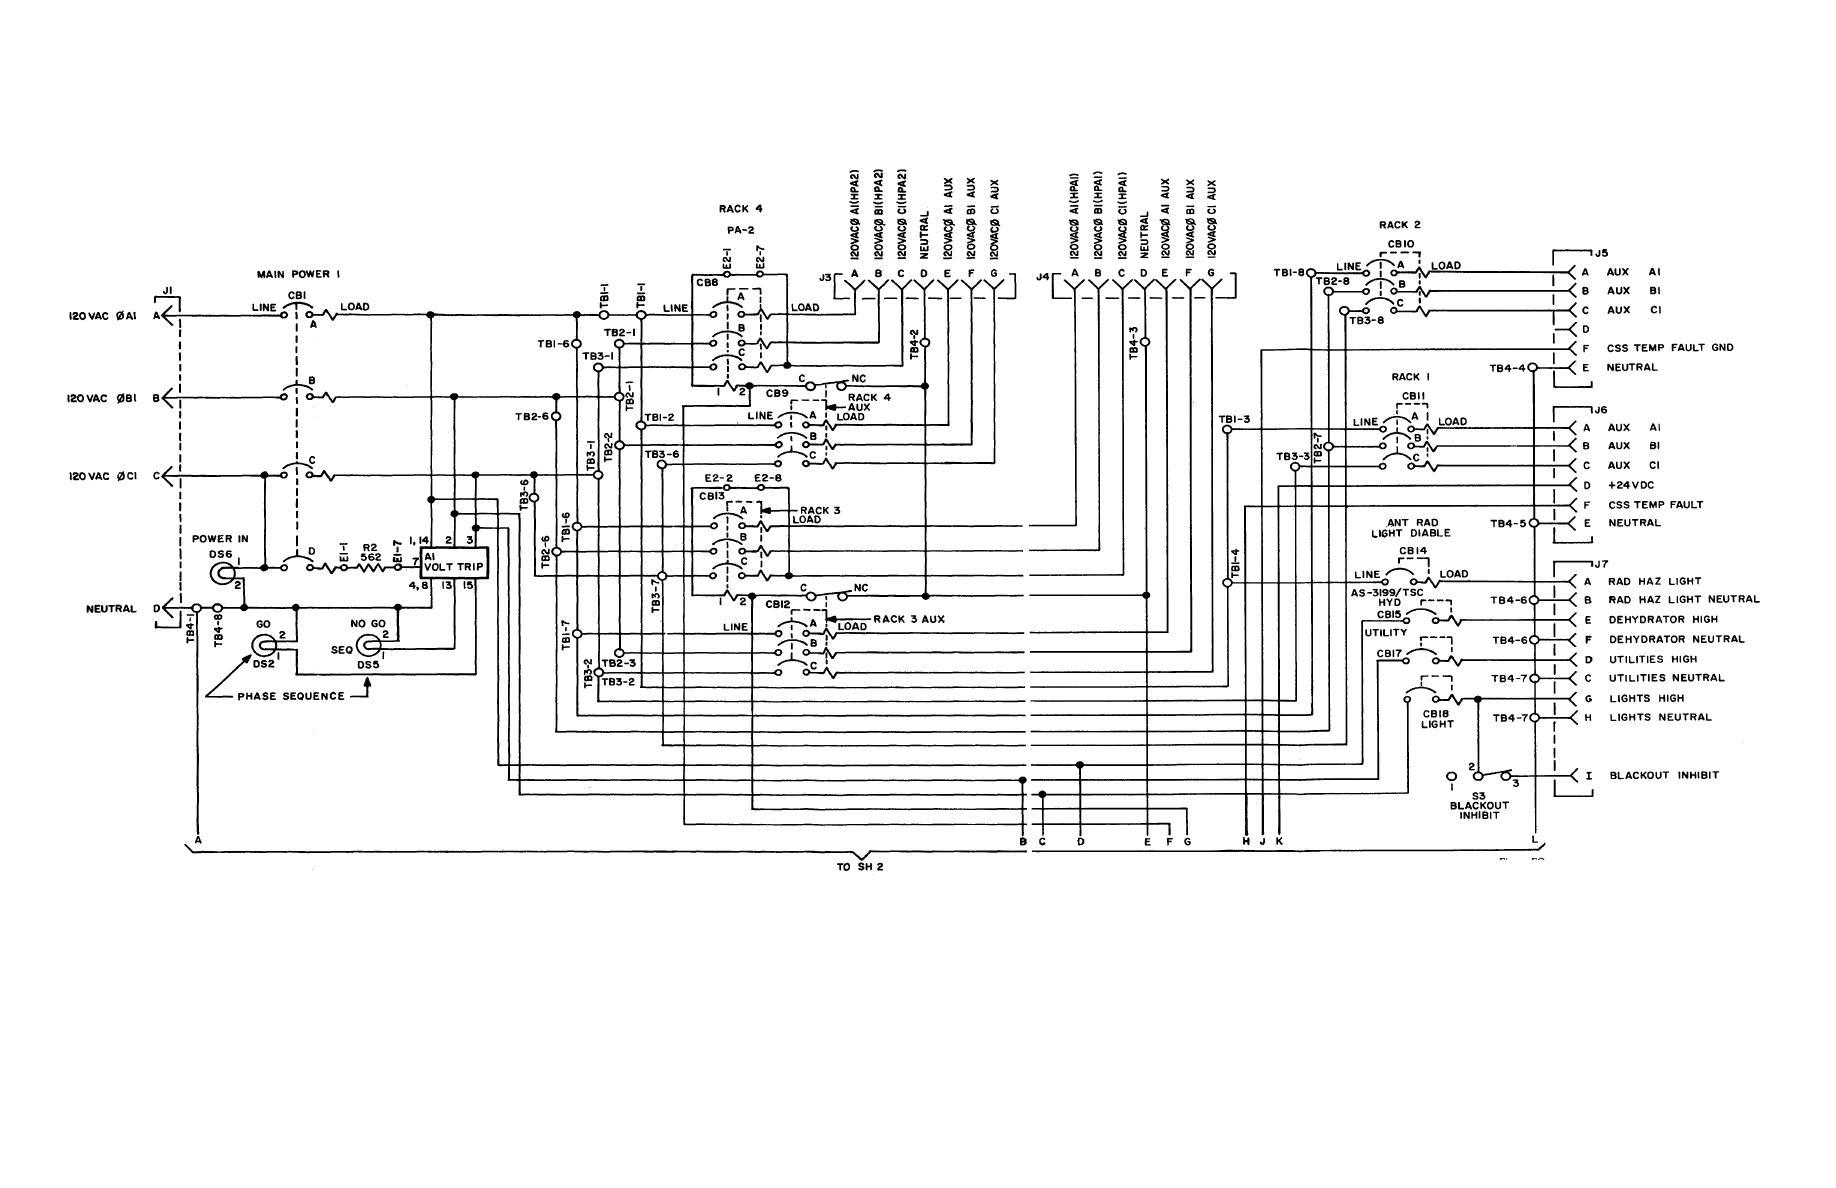 Terrific Power Distribution Wiring Diagrams General Wiring Diagram Data Wiring Cloud Ymoonsalvmohammedshrineorg